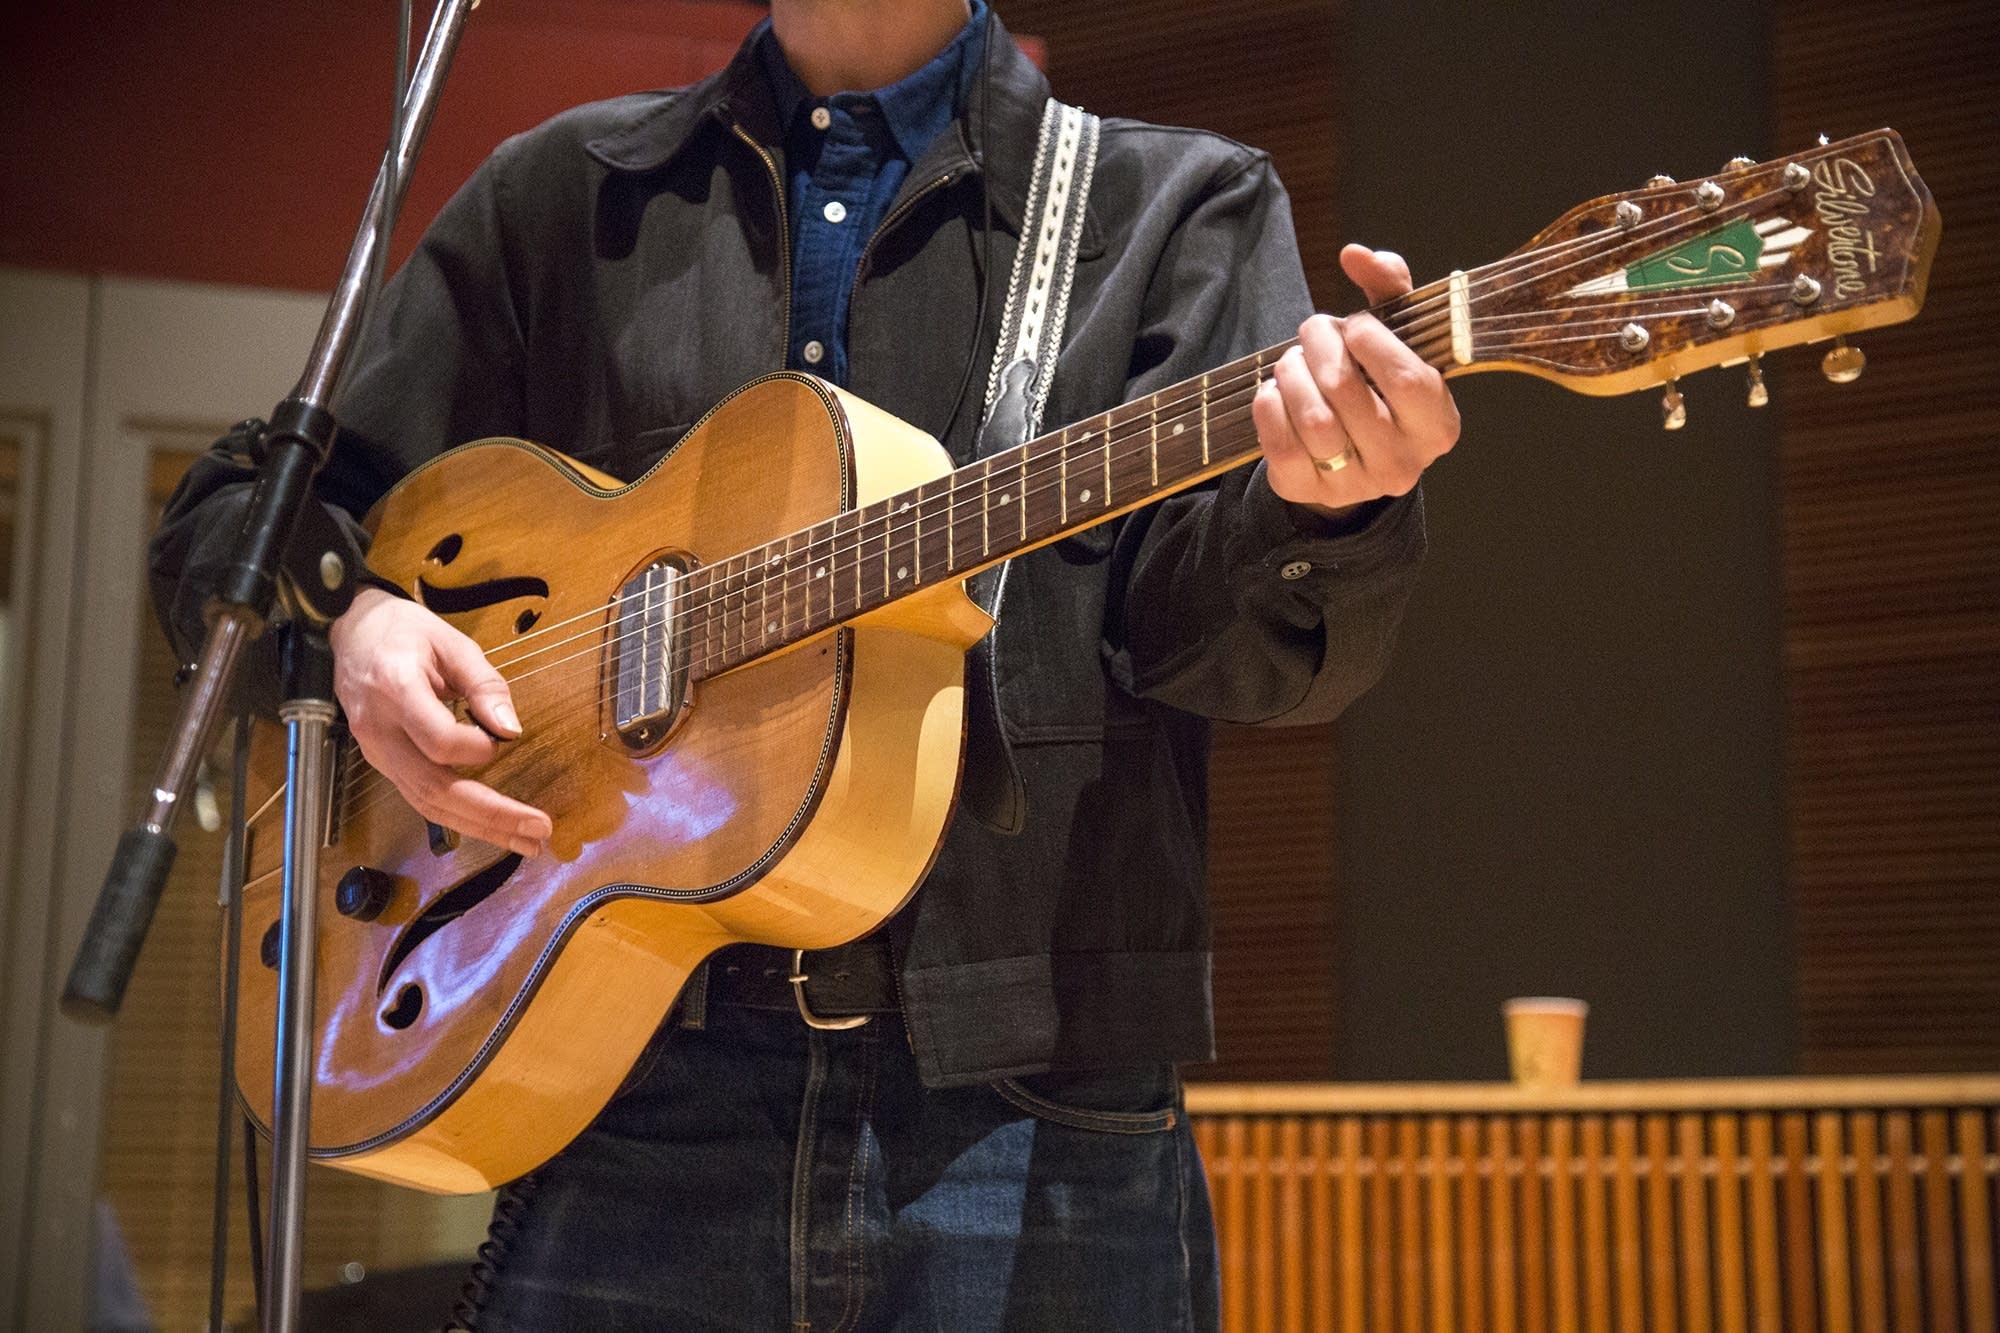 Jack Torrey's Silvertone Guitar